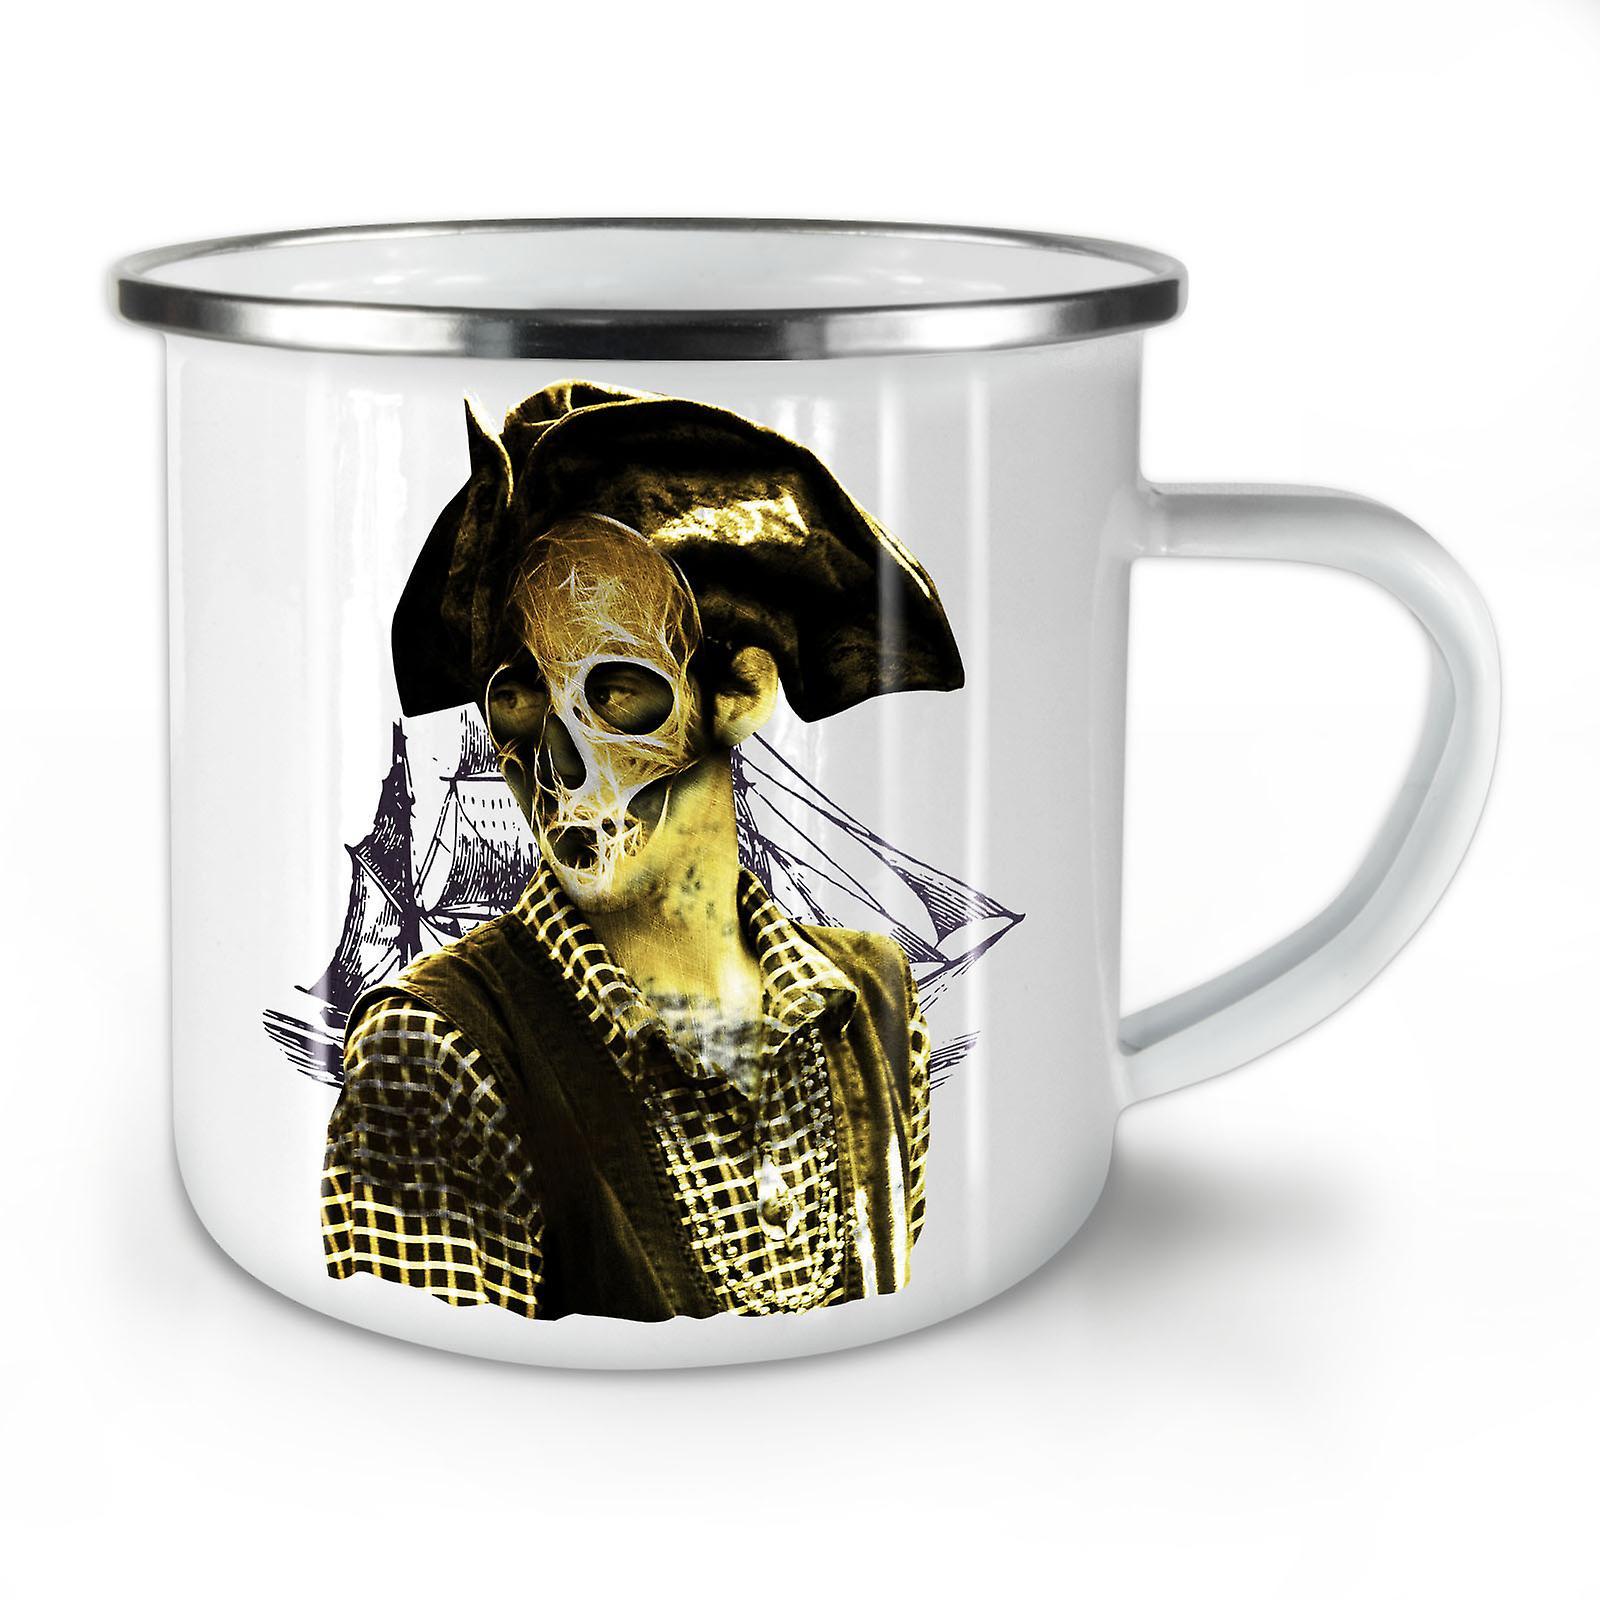 Émail Pirate Whitetea Métal Nouveau Mug10 OzWellcoda Death Café clK1TJF